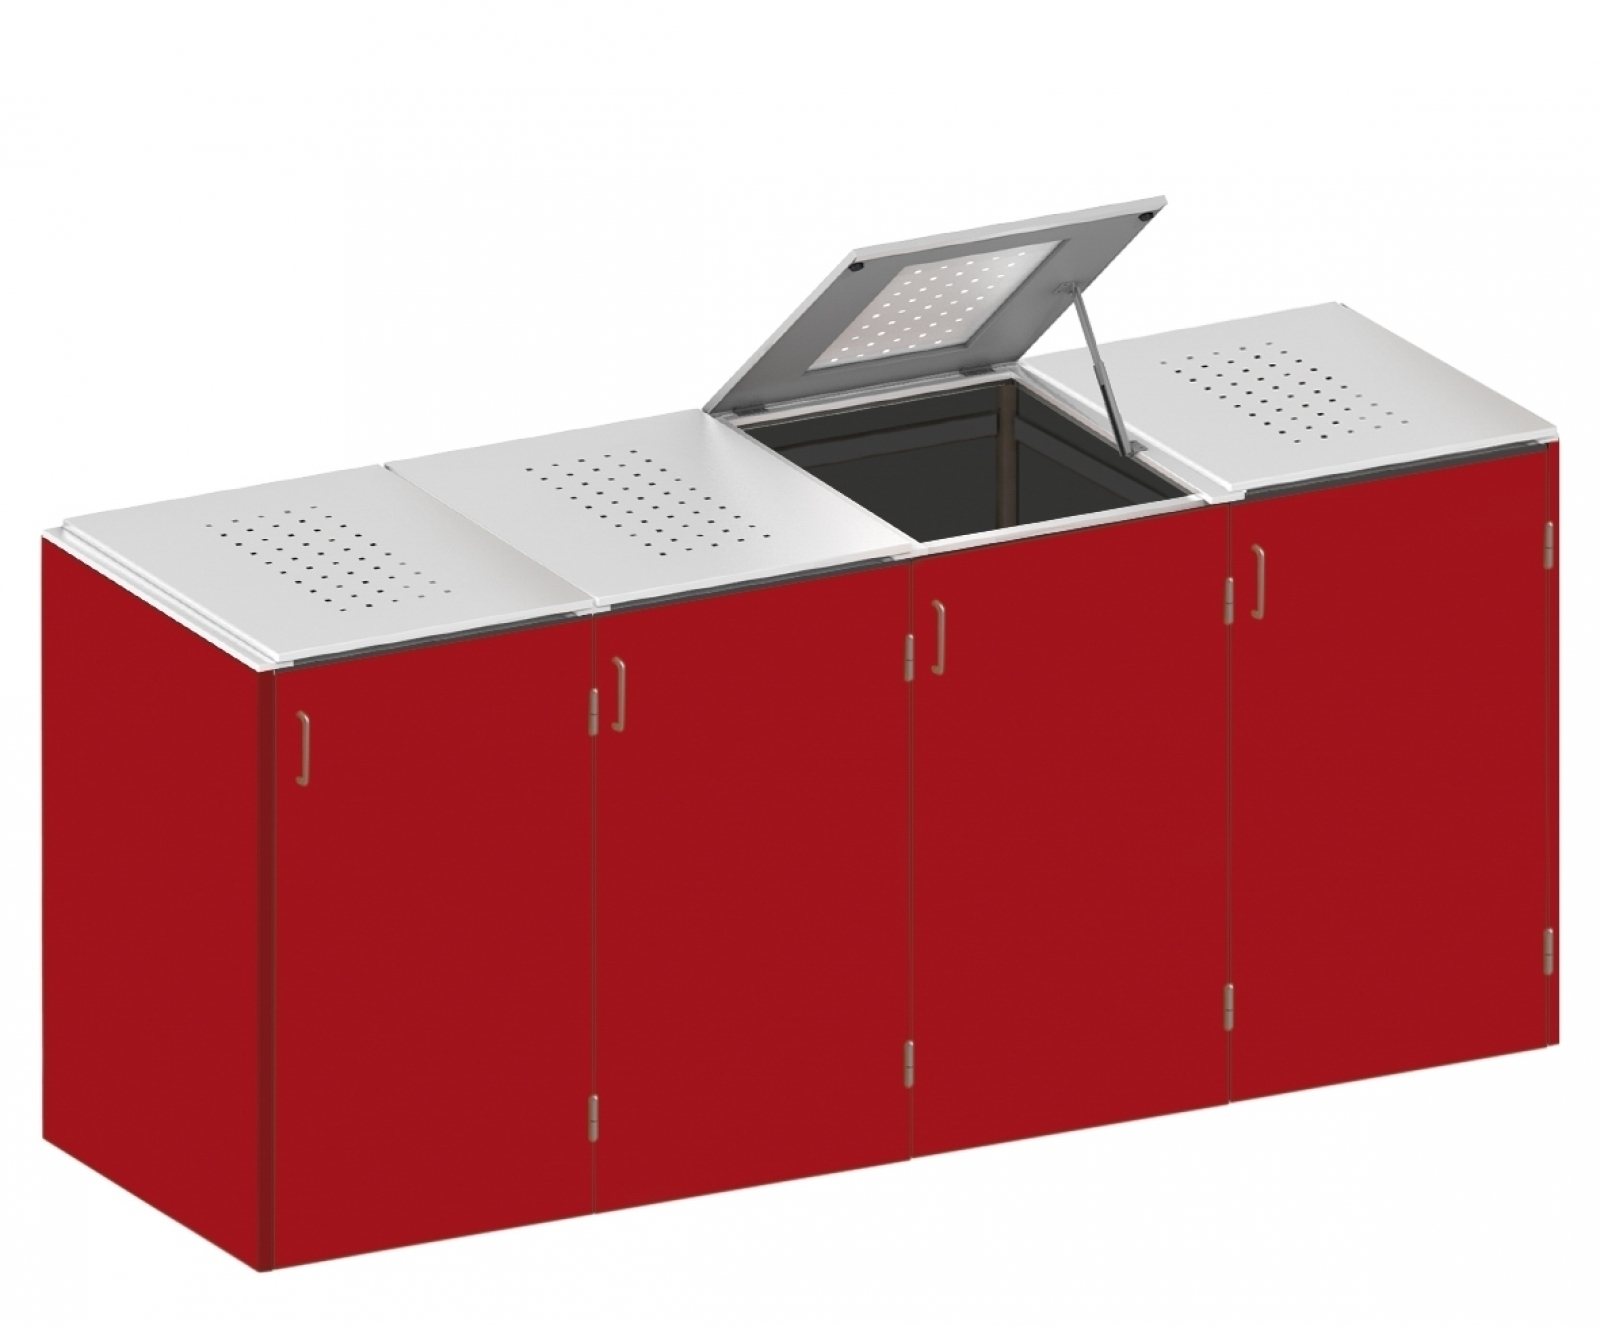 binto mülltonnenbox hpl rot- edelstahl system e4k